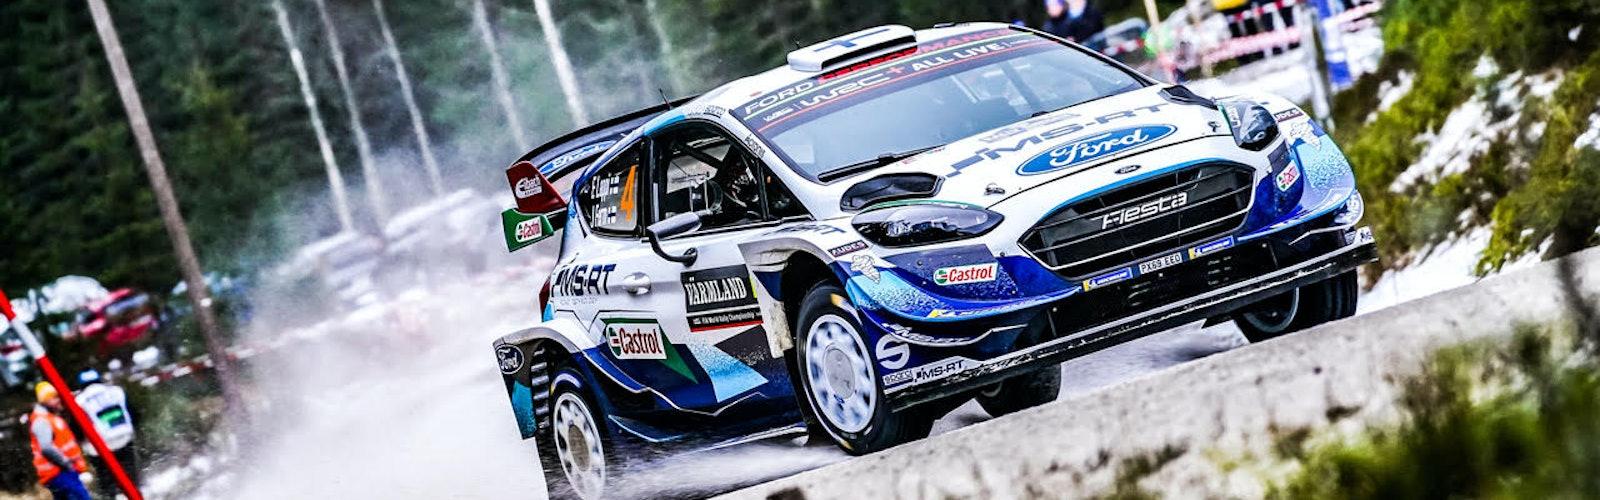 Esapekka Lappi M-Sport Ford Rally Sweden WRC 2020